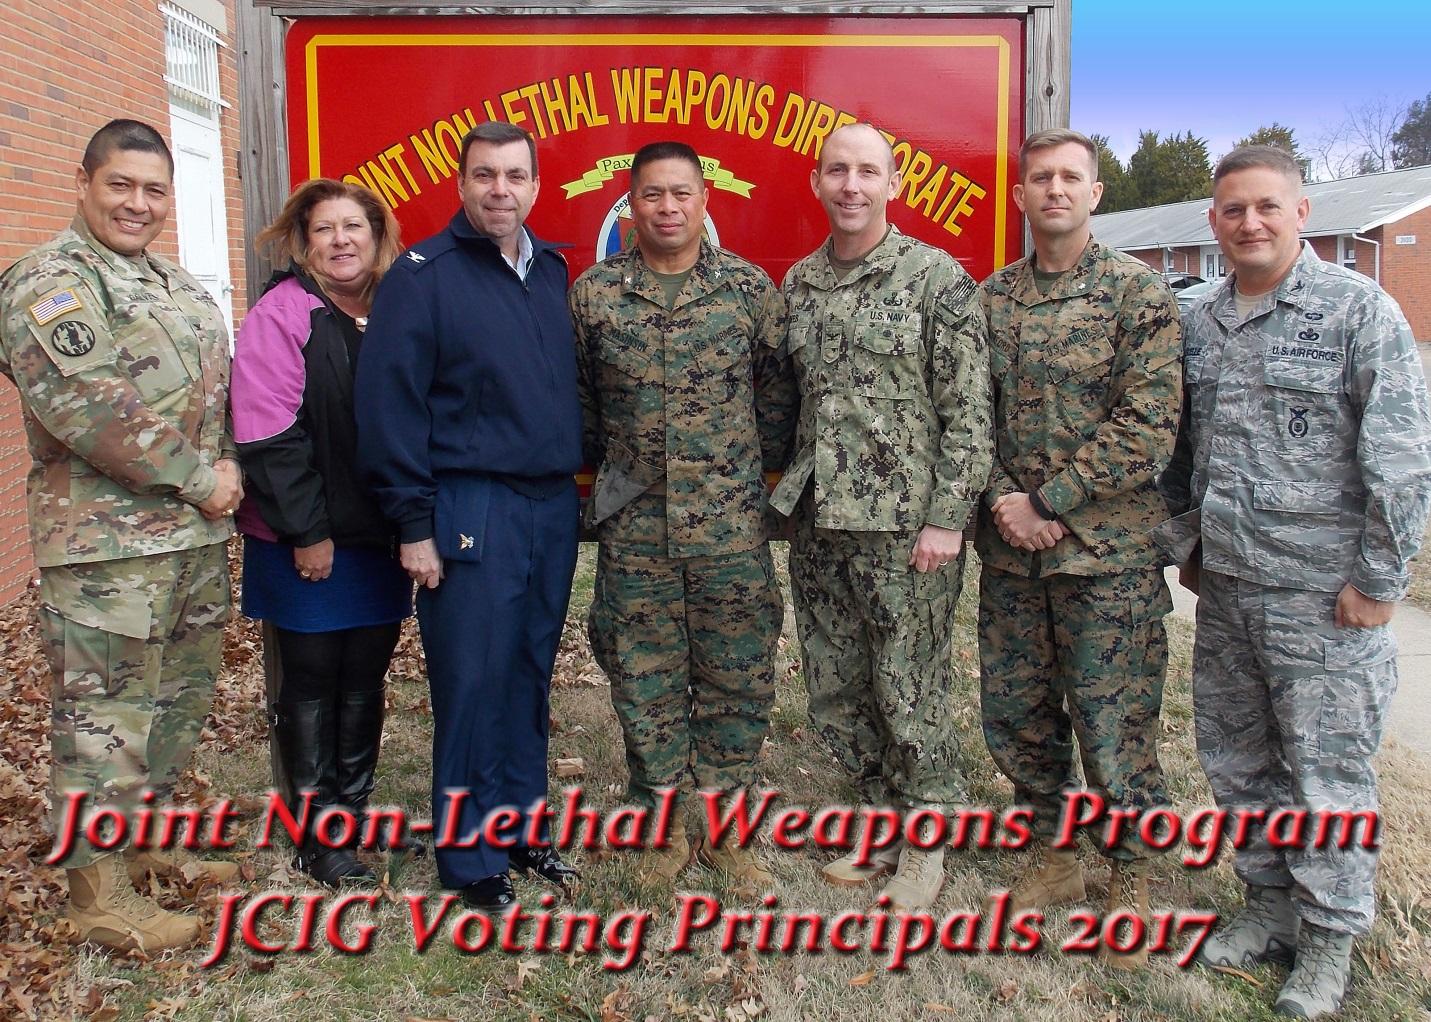 JNLWP JCIG Voting Principals